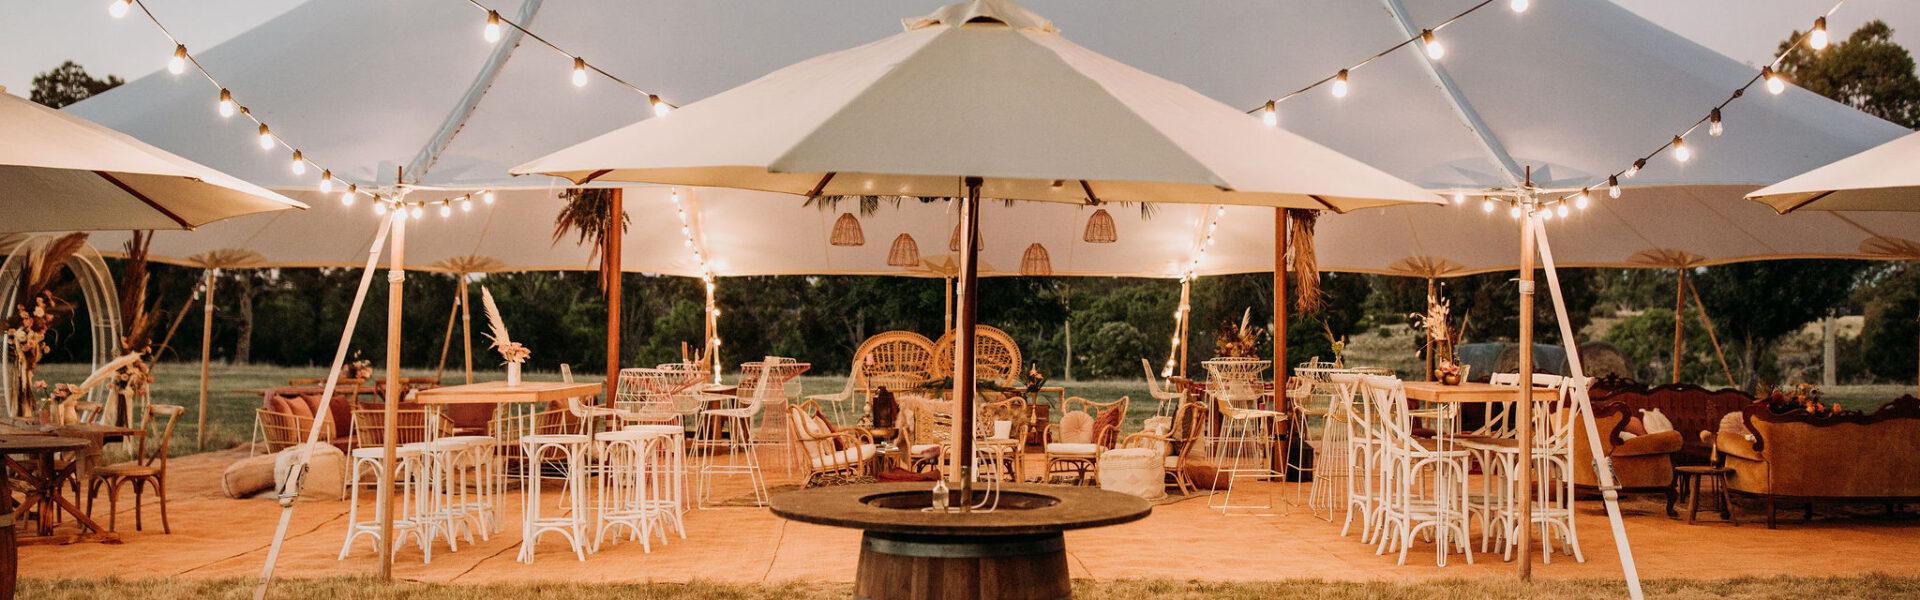 Event furniture & wedding décor hire, Geelong